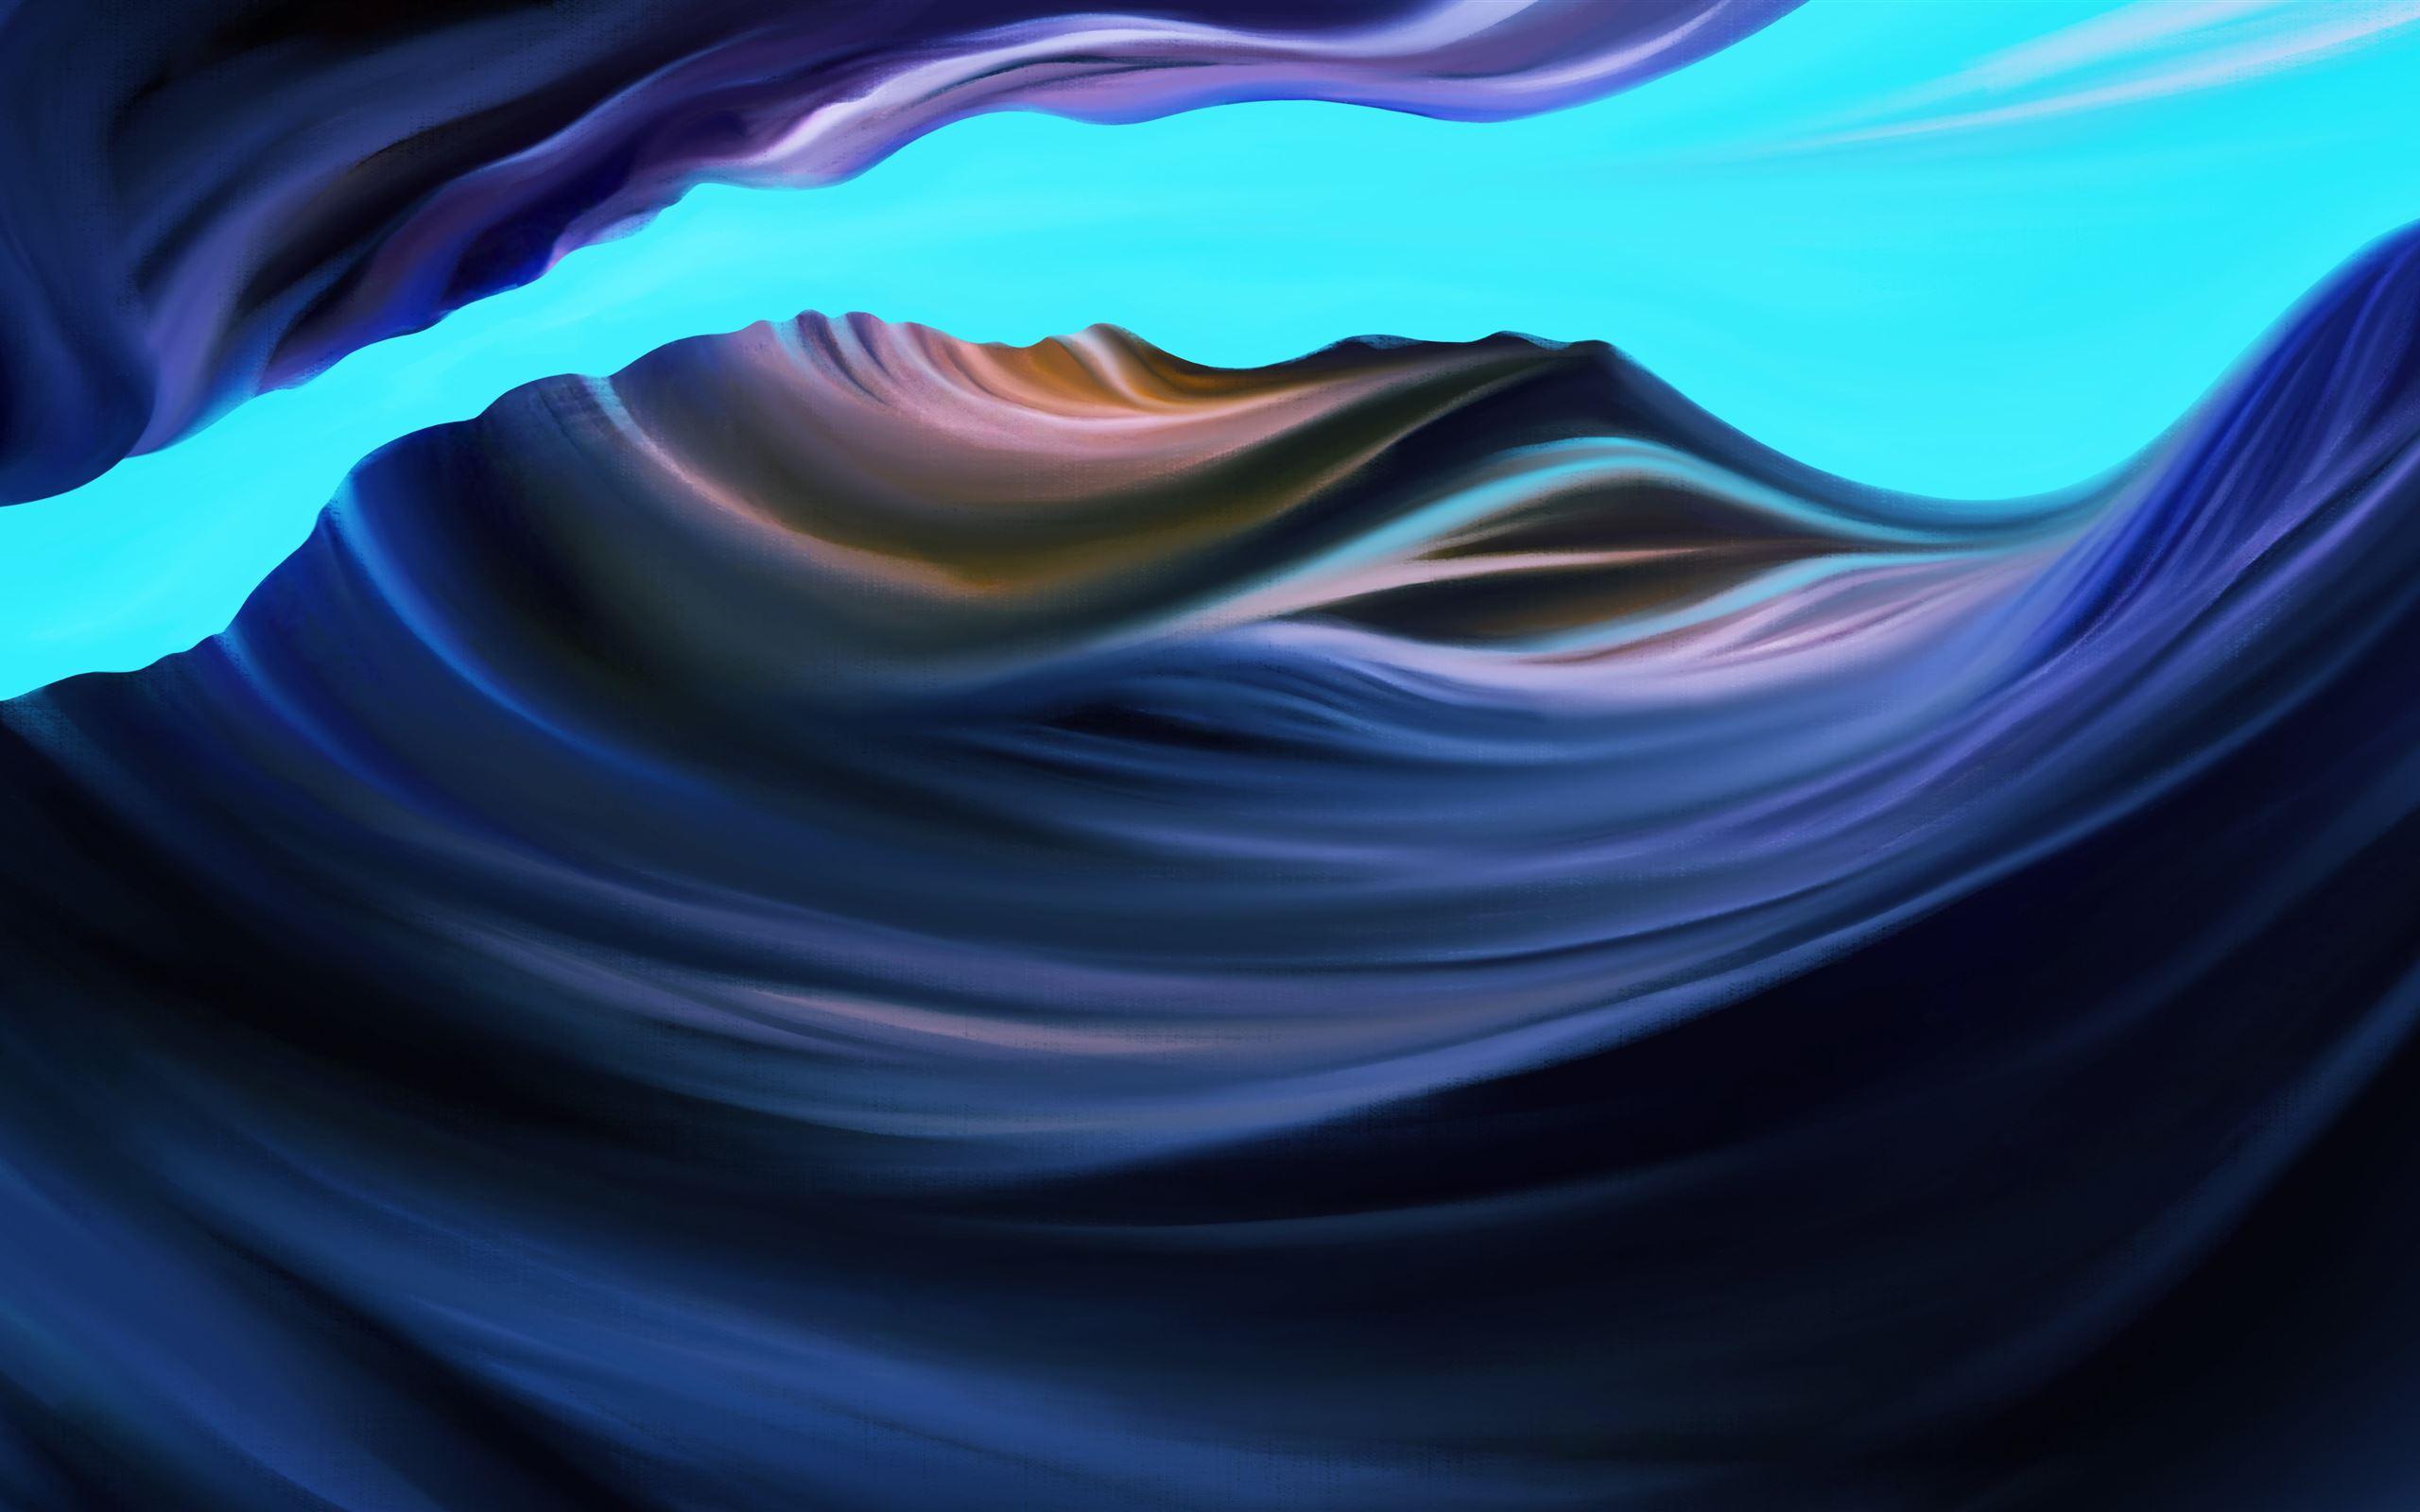 Colorful Canyon 4k 5k Macbook Pro Wallpaper Download Allmacwallpaper